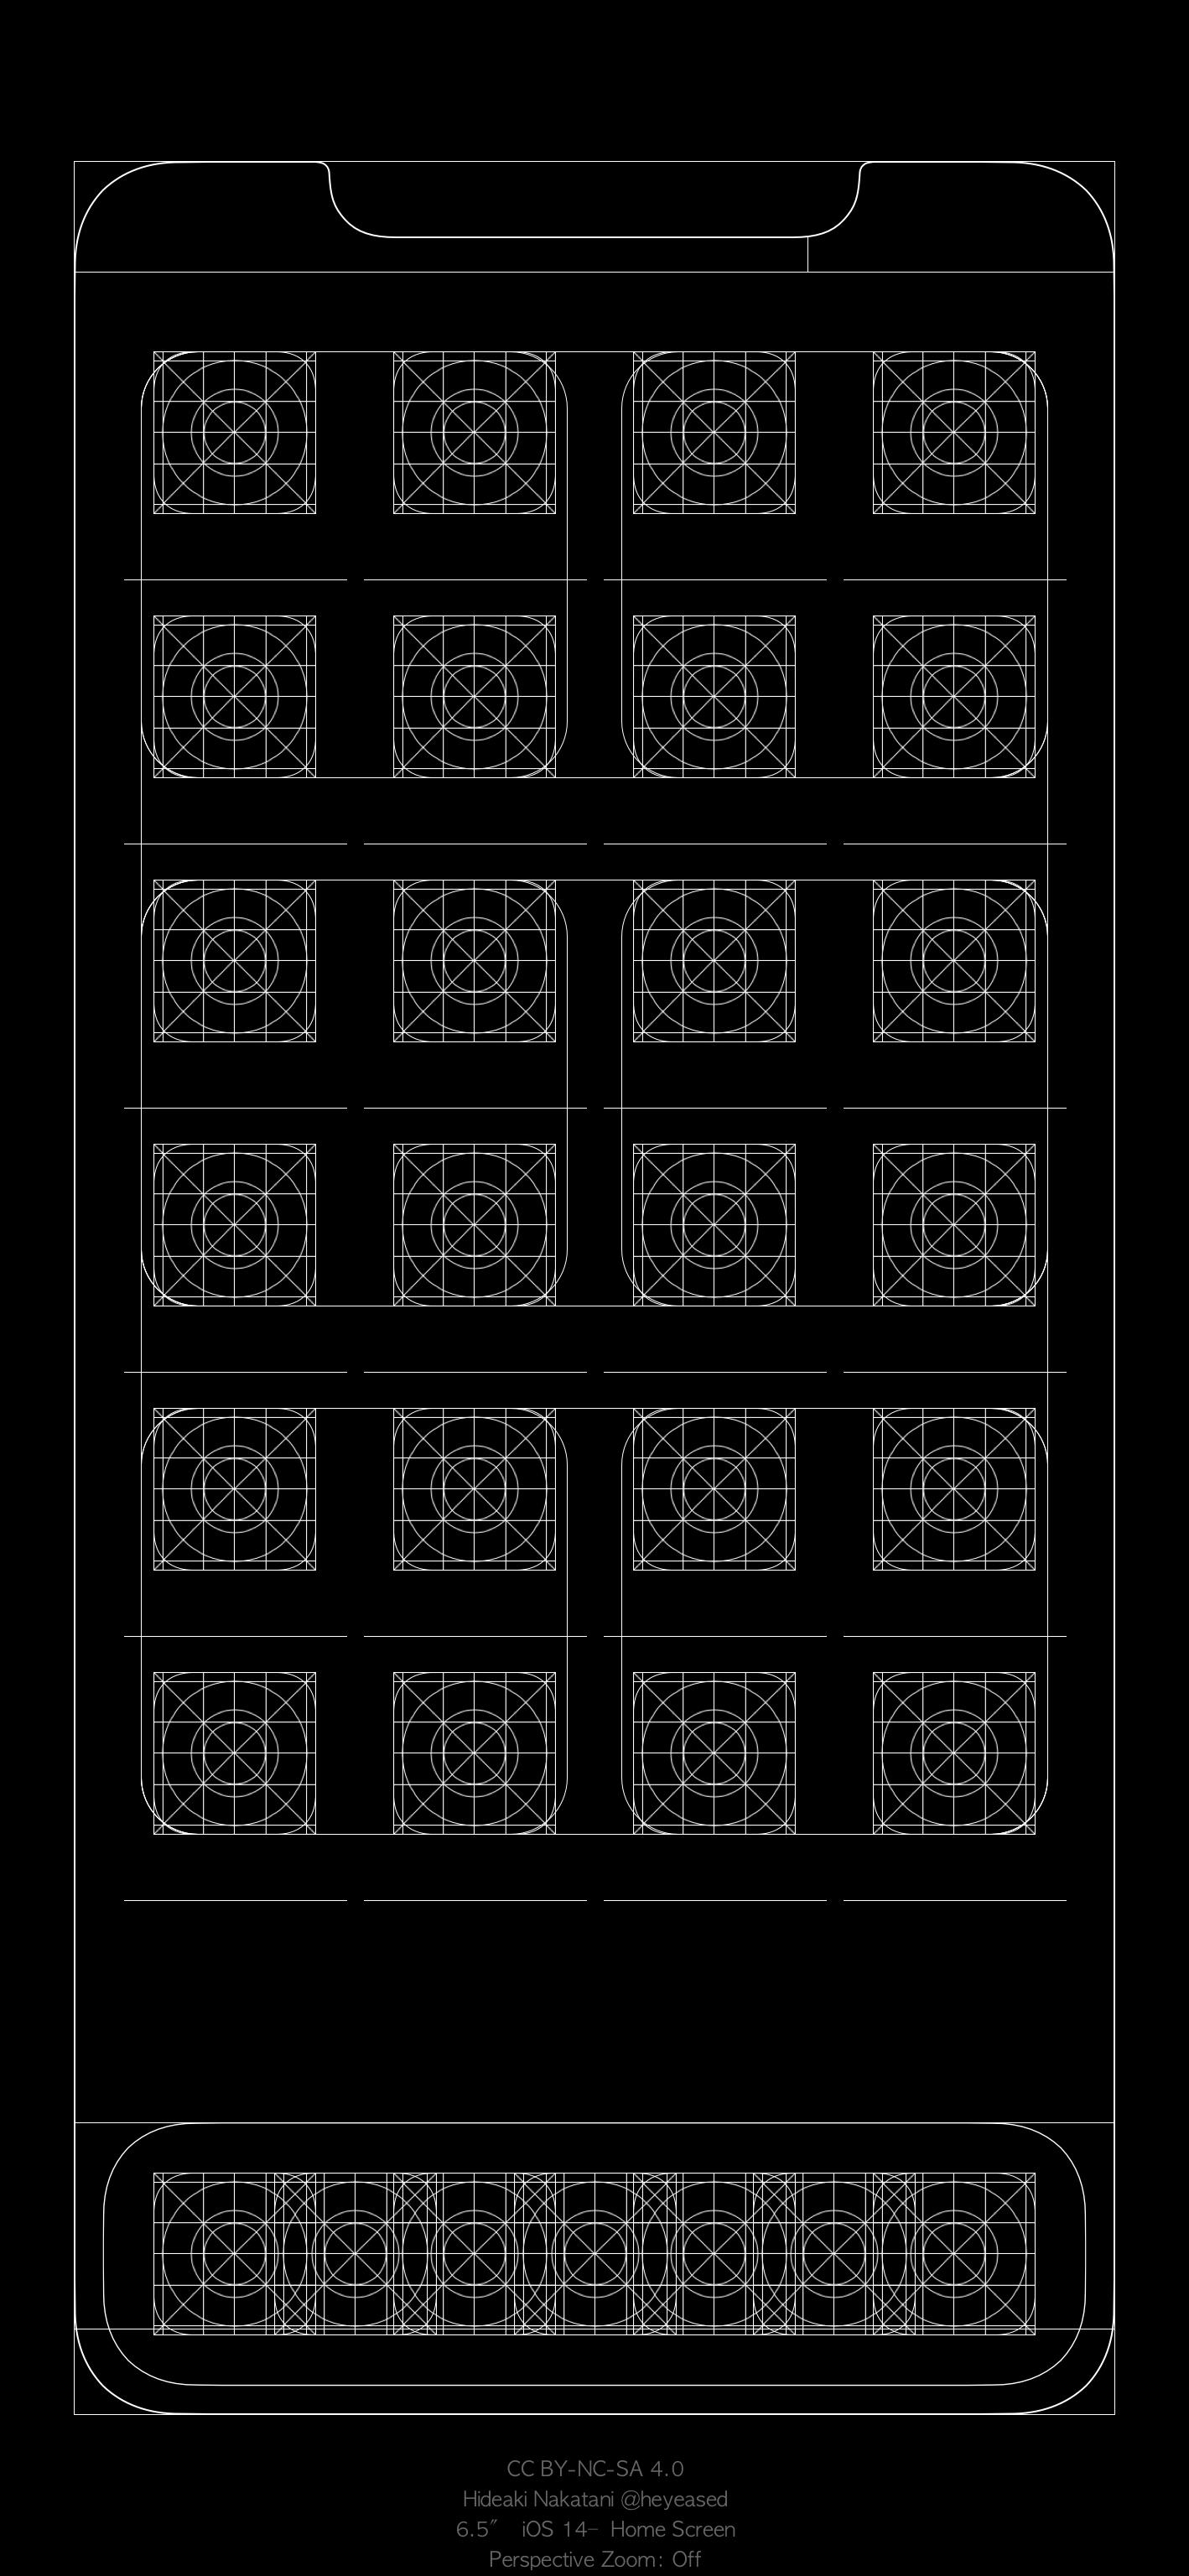 Ladda ner Blueprint-bakgrundsbilder till iPhone XS Max